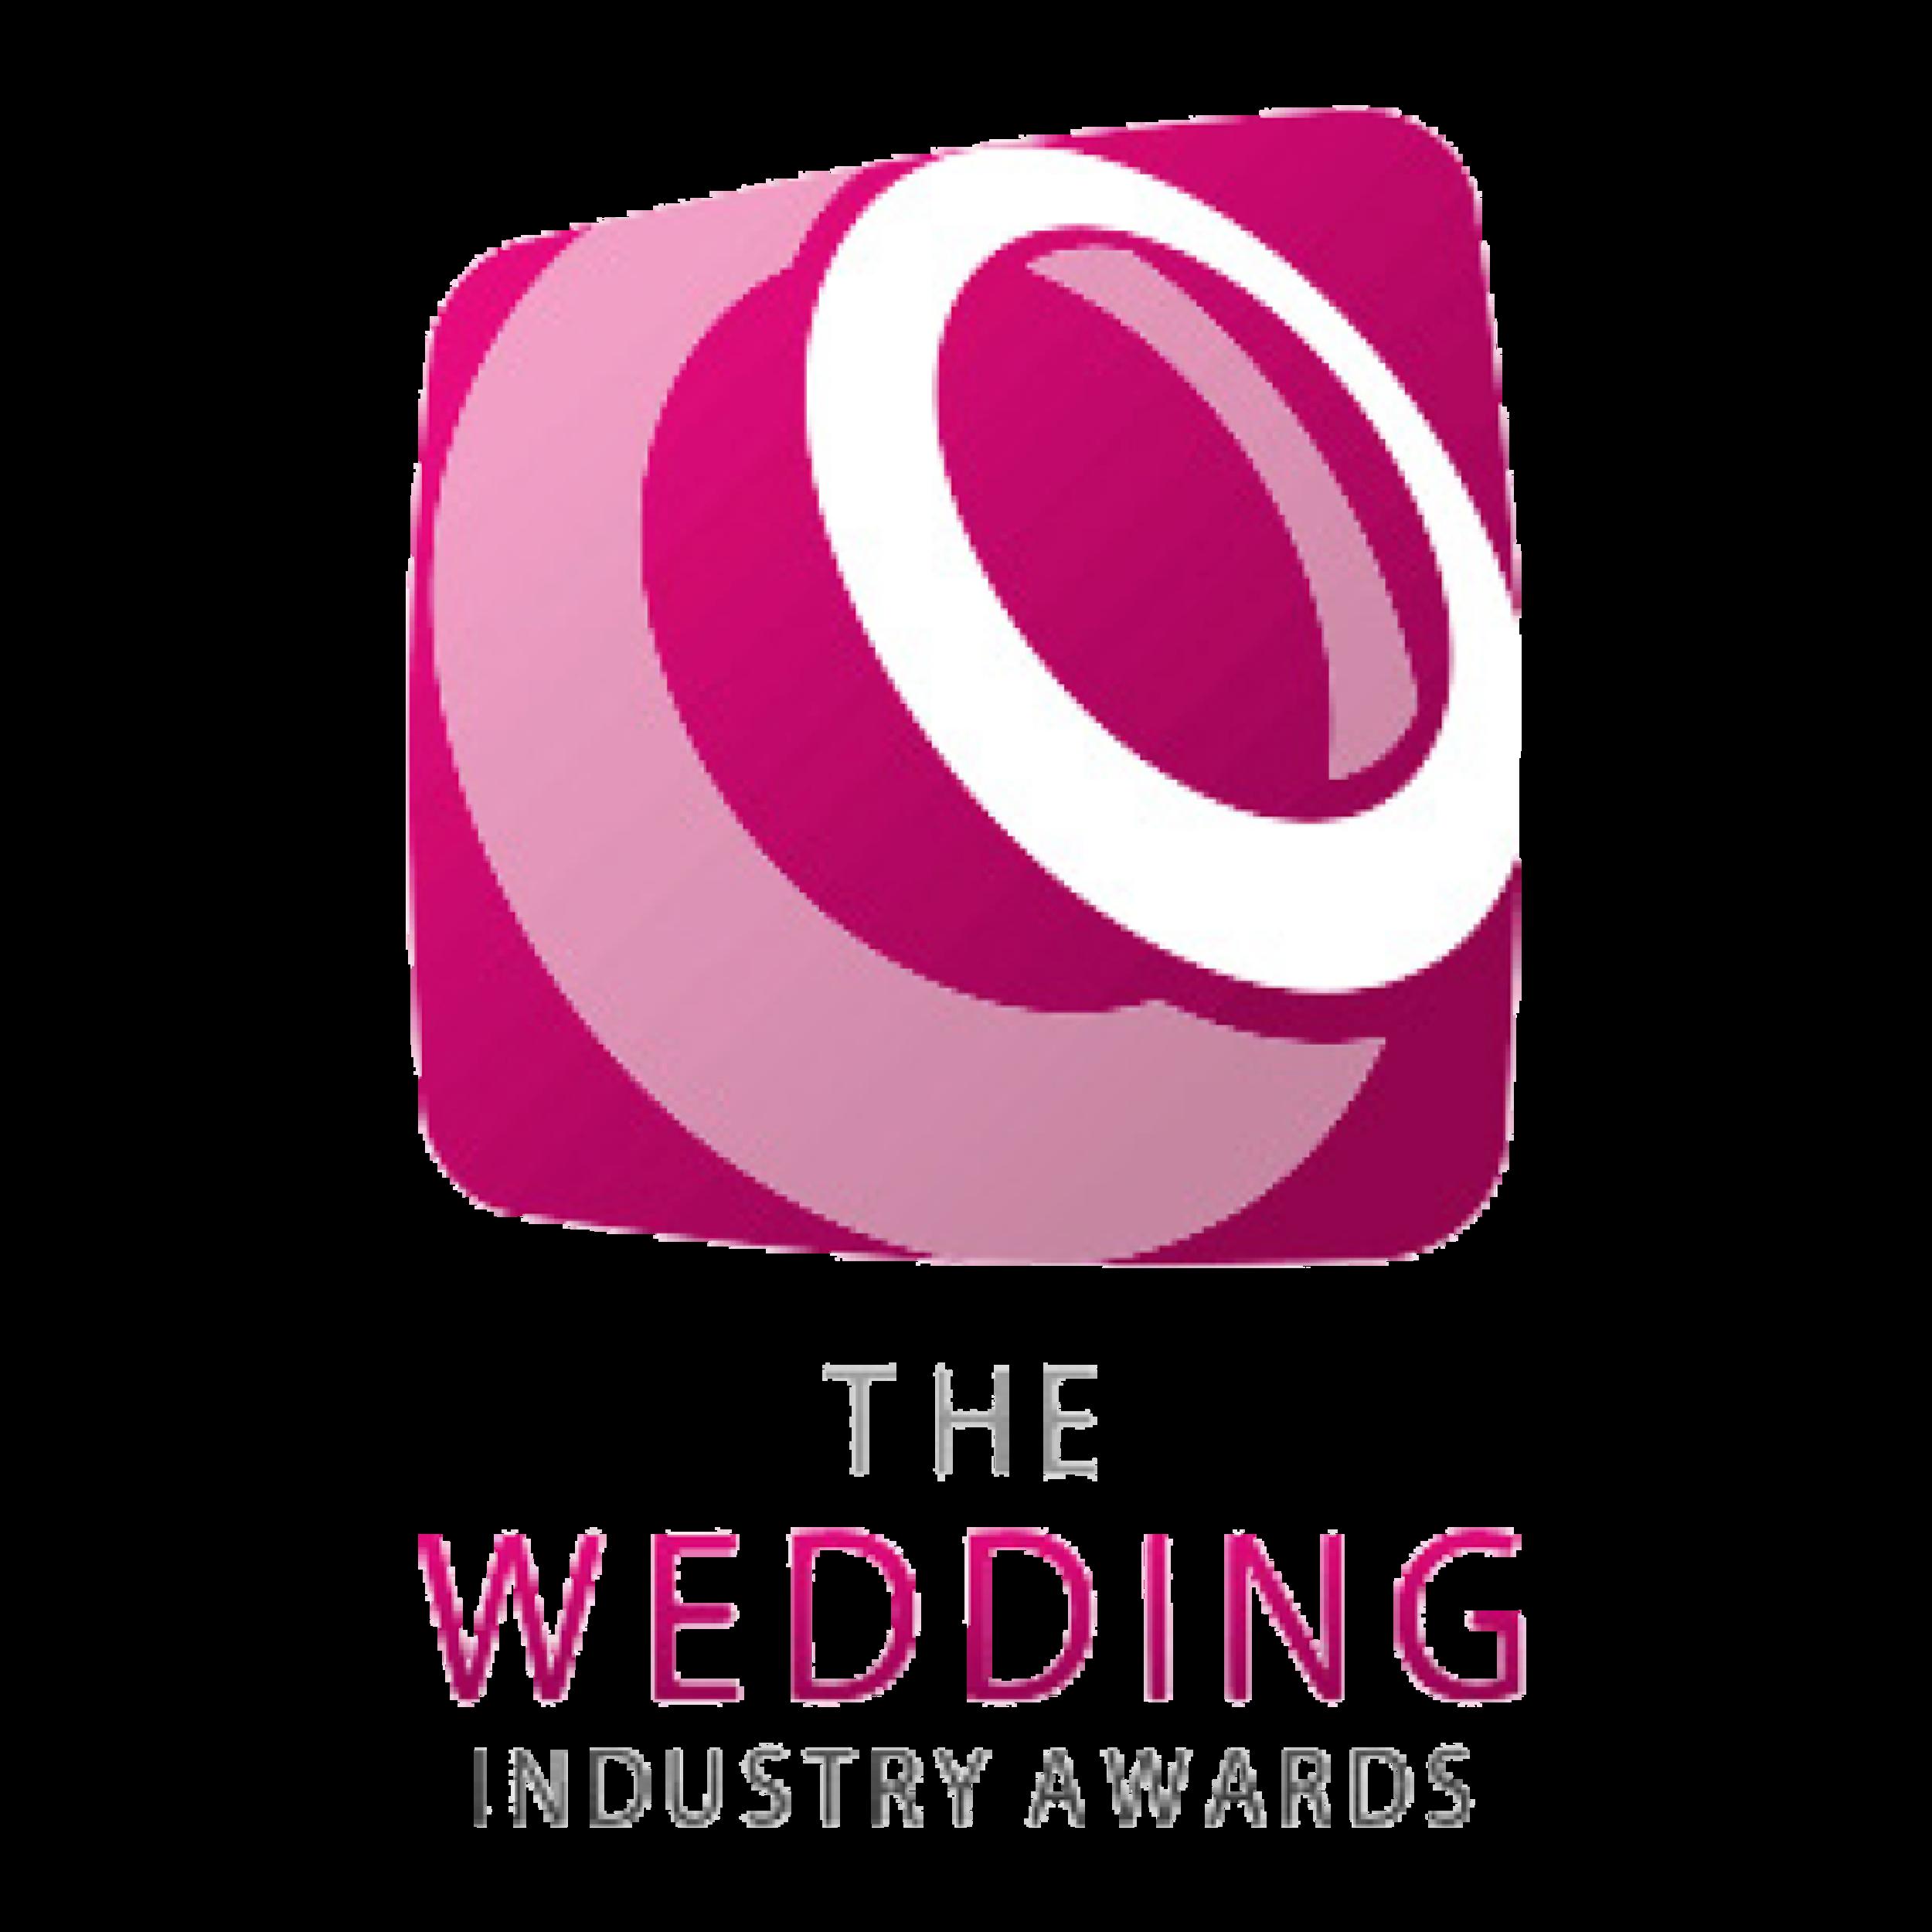 Terry Fox | The Wedding Industry Awards